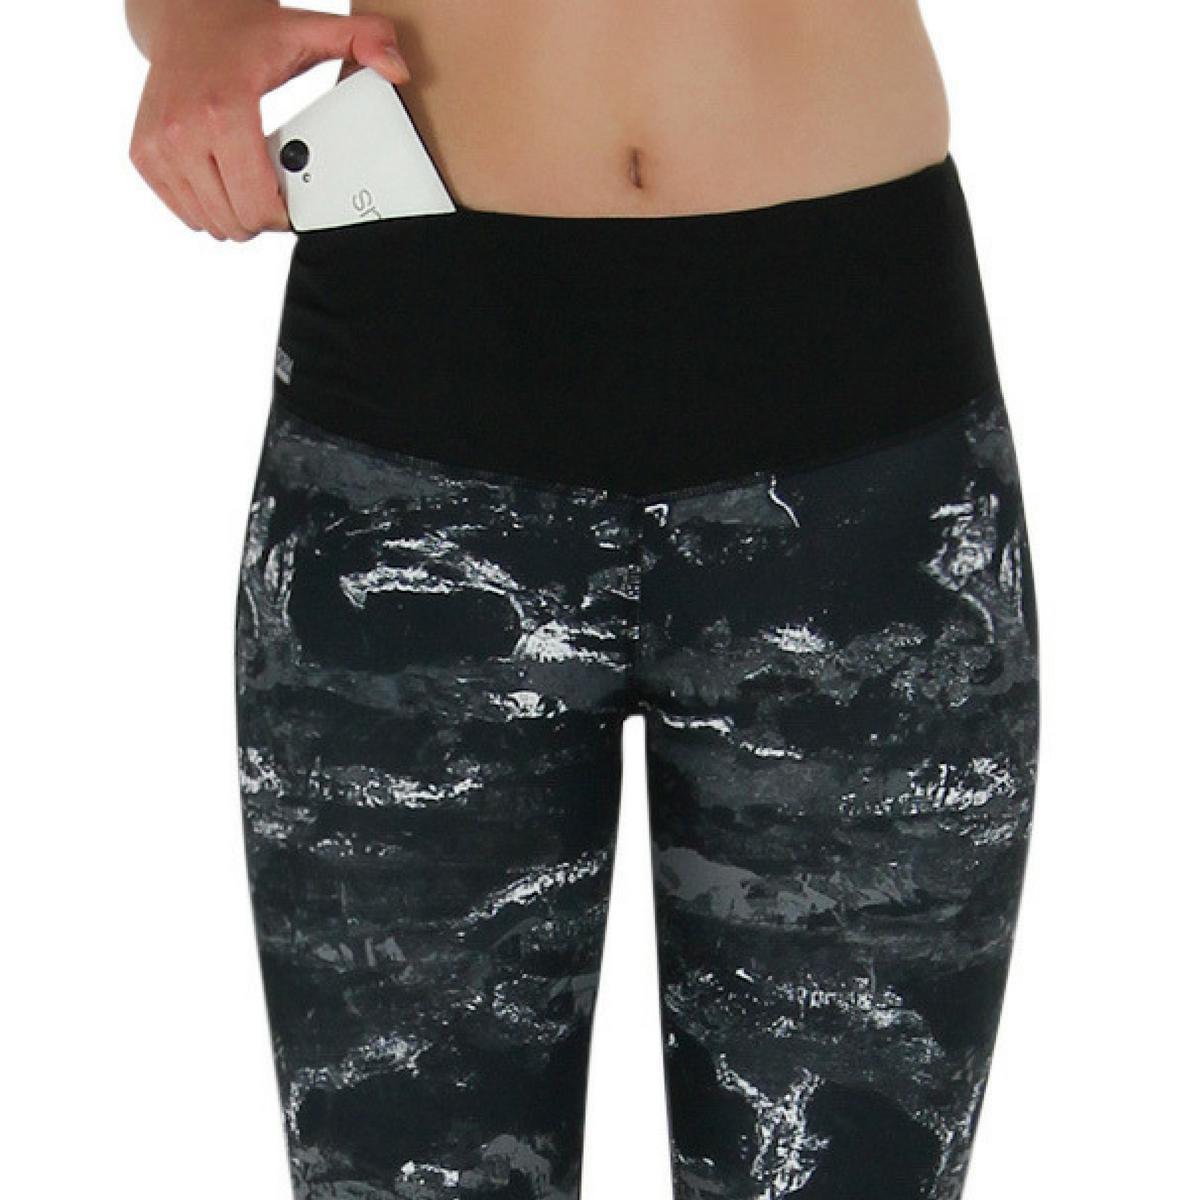 damen sport leggings mit marmormuster online g nstig kaufen. Black Bedroom Furniture Sets. Home Design Ideas